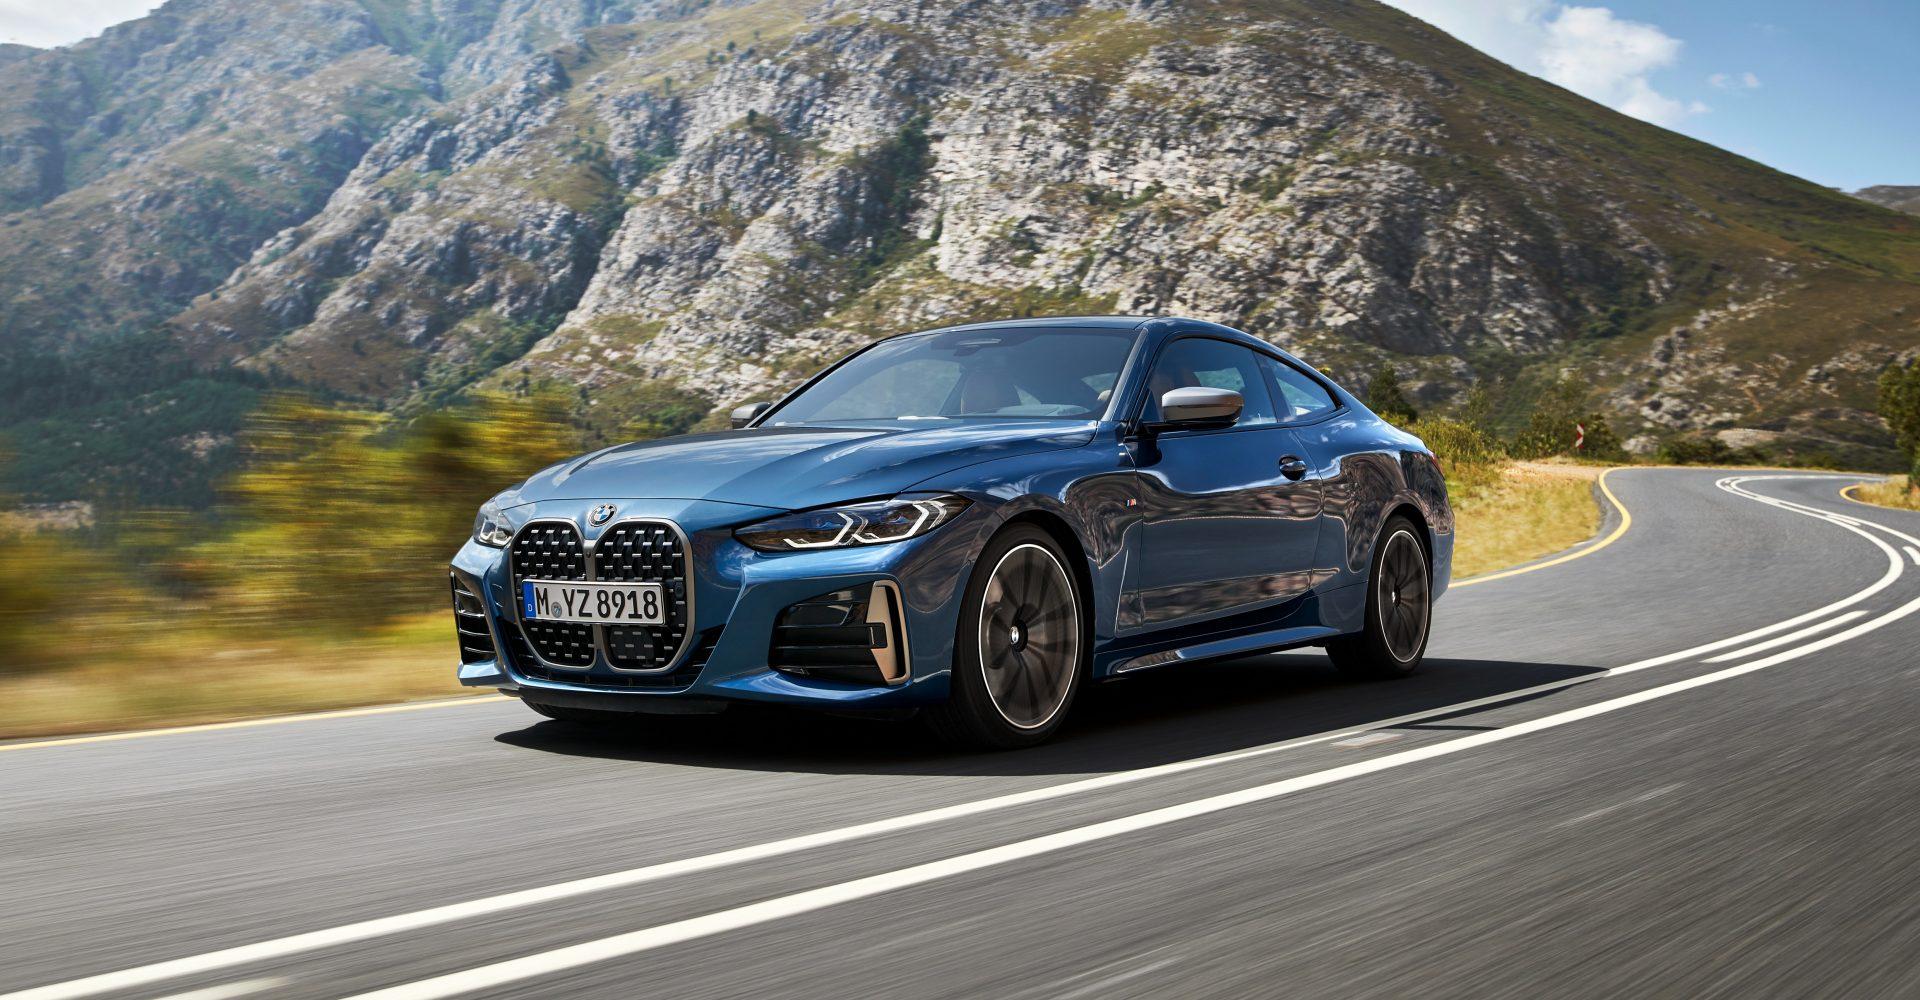 BMW unveils eye-catching new 4 Series